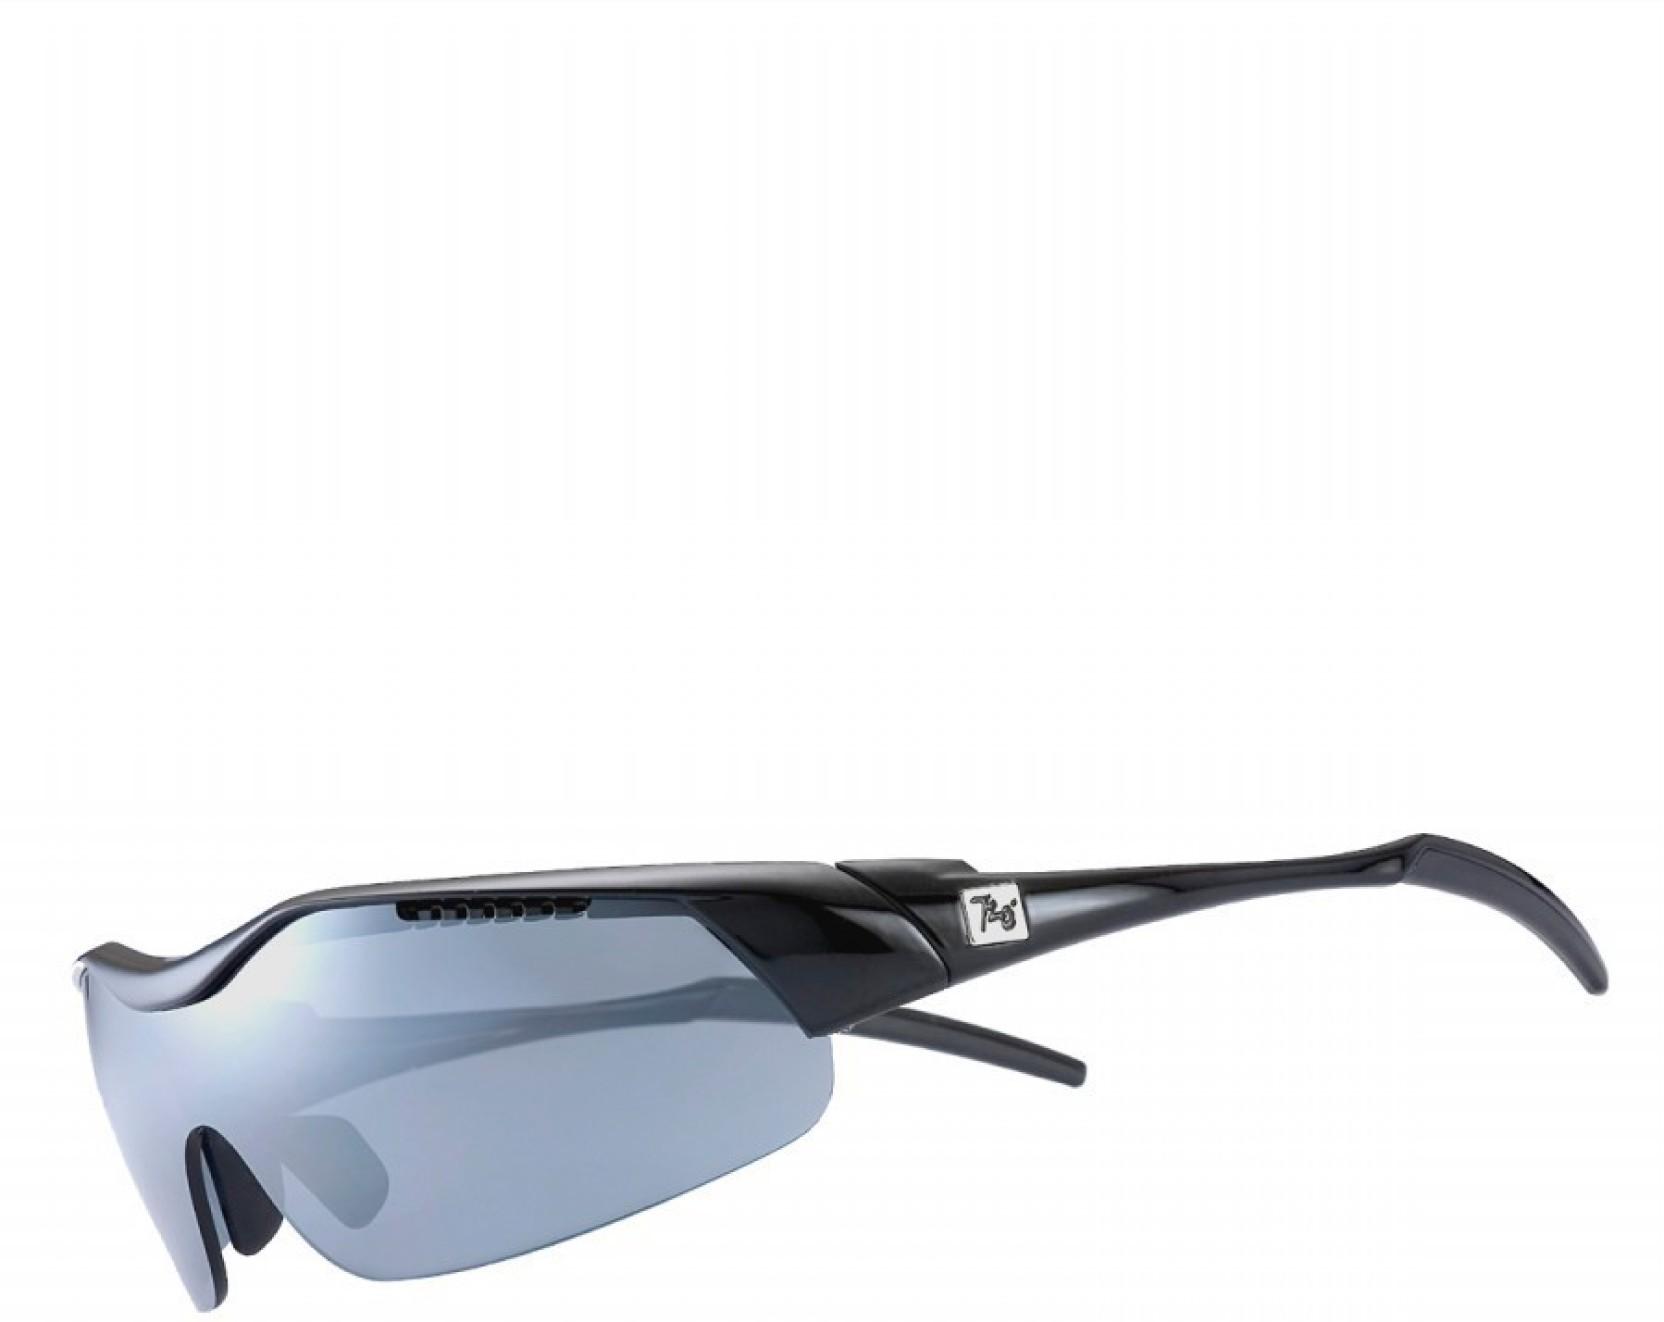 f1e3c15180 Armour hitman cycling goggles buy armour hitman jpg 1664x1322 Hitman goggles